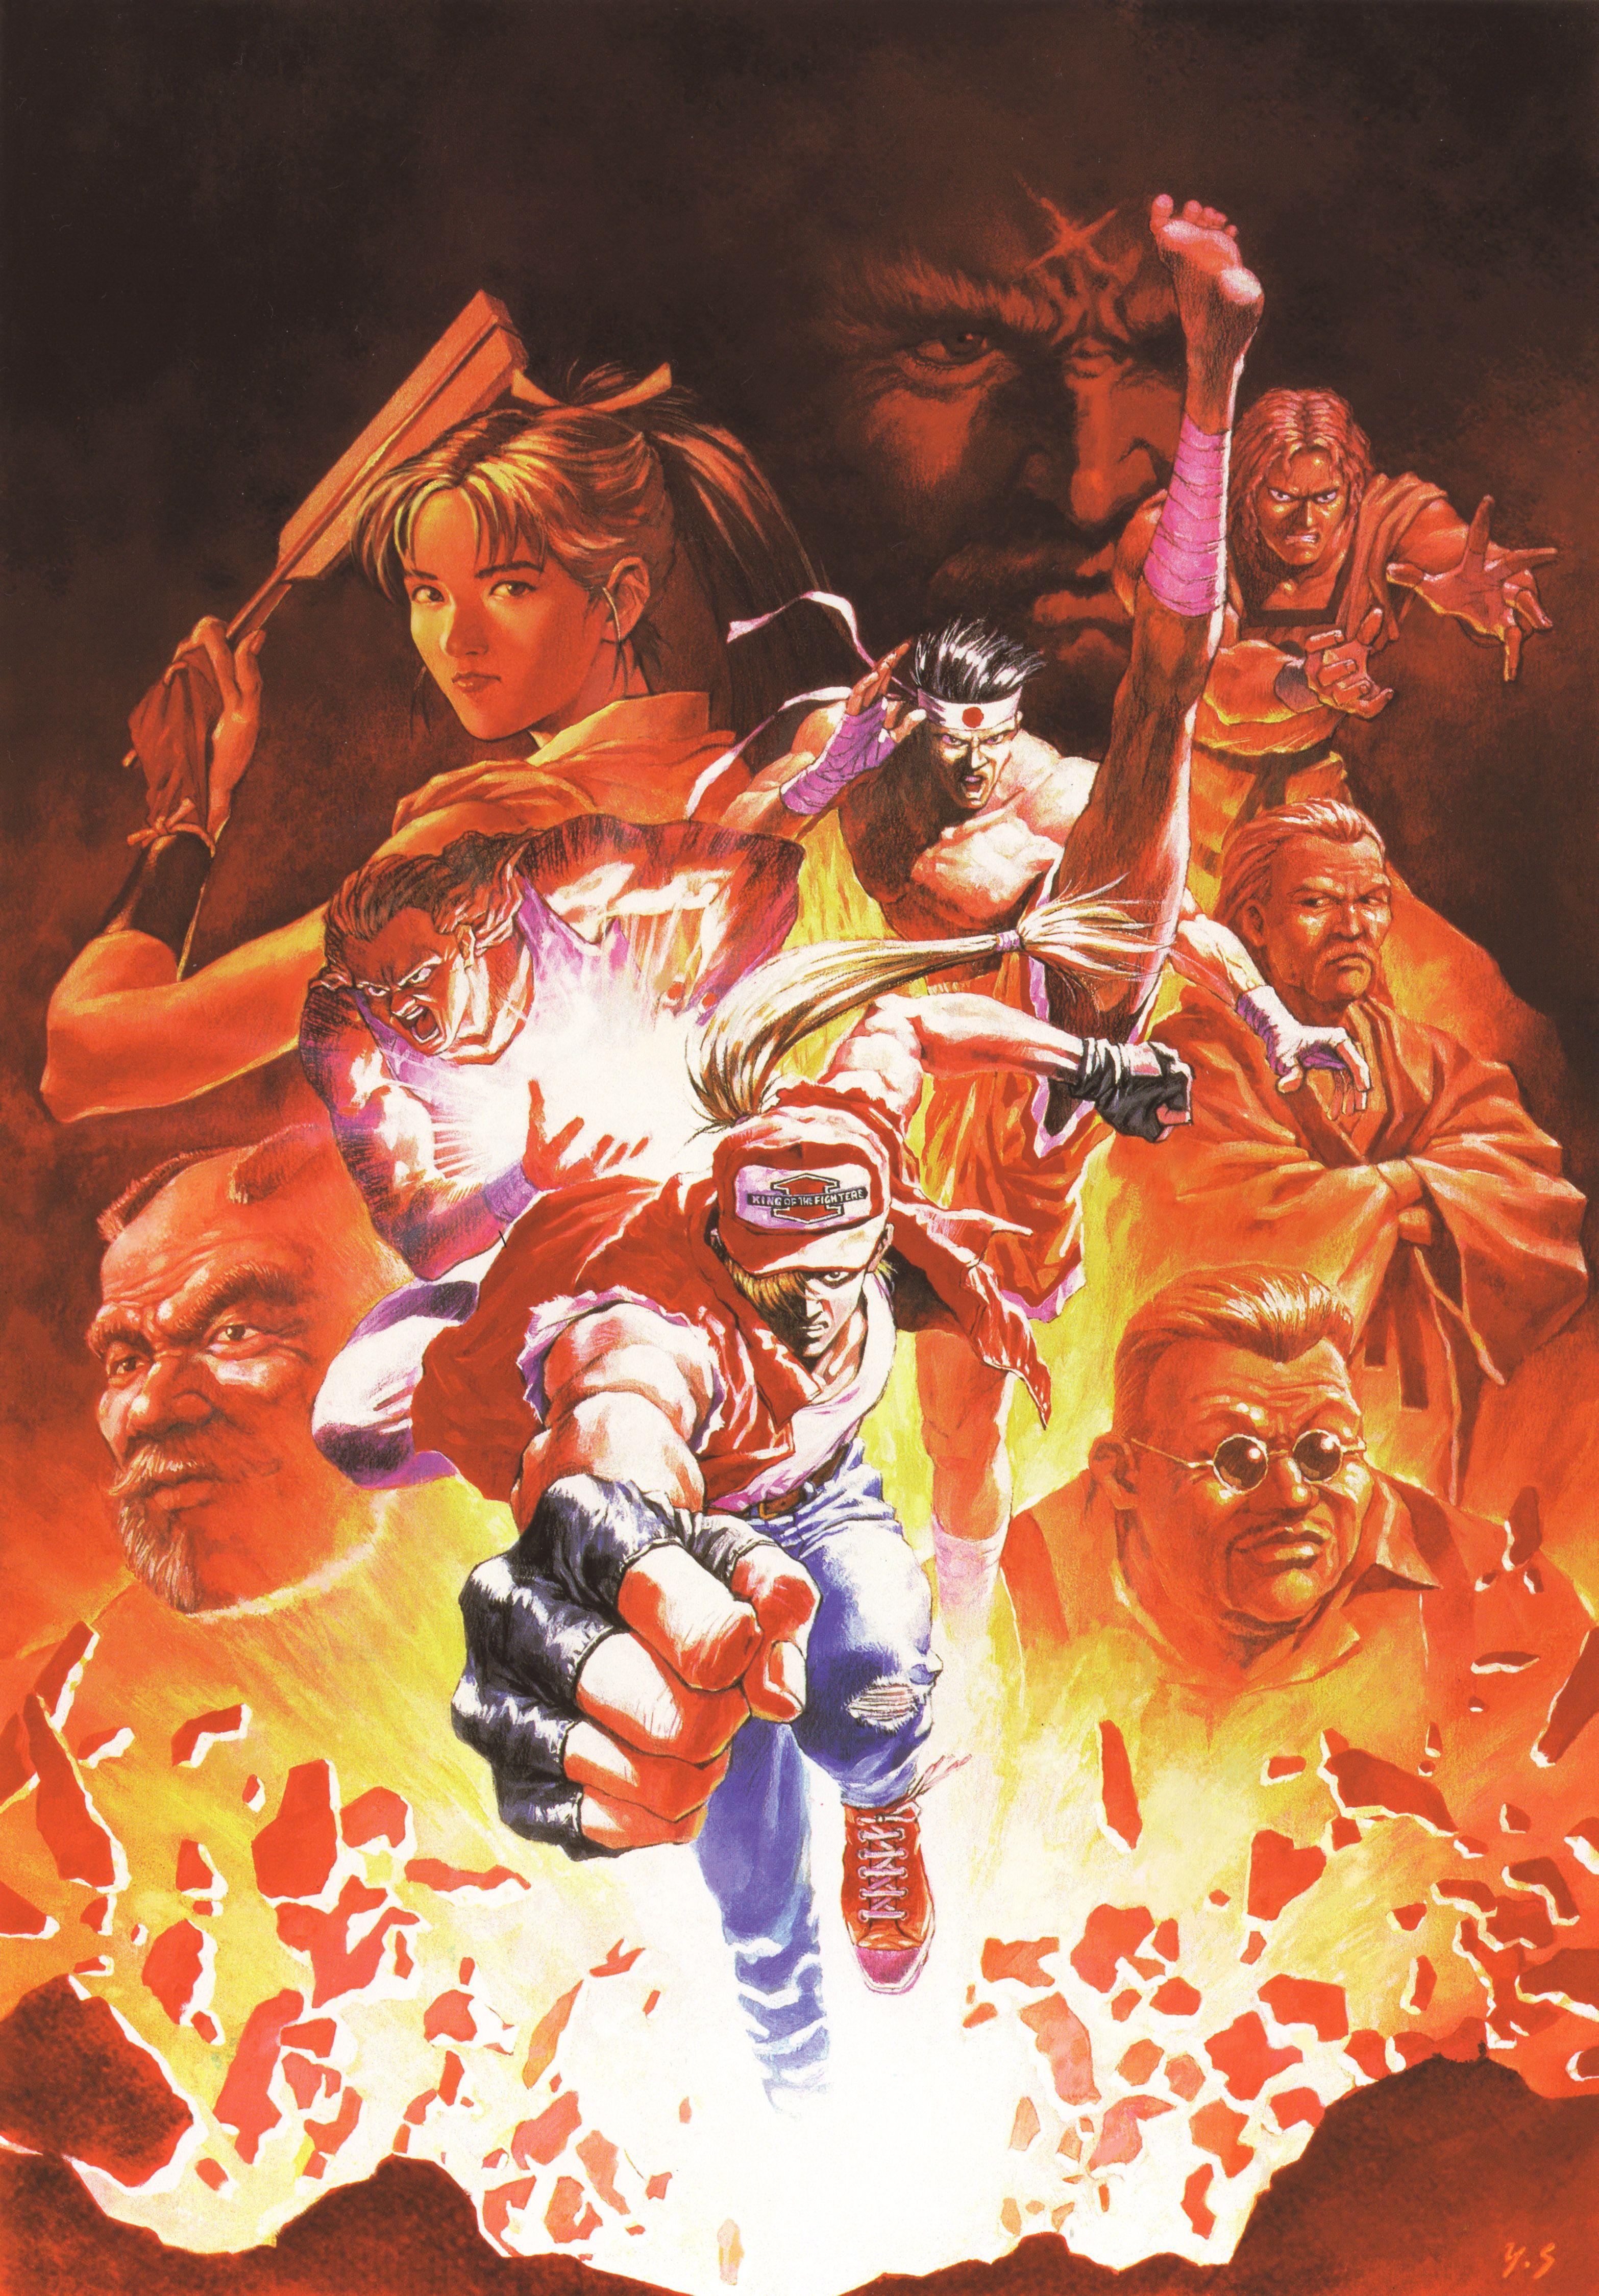 Fatal Fury 2 Game Art Concept Art Digital Art Of Fighting